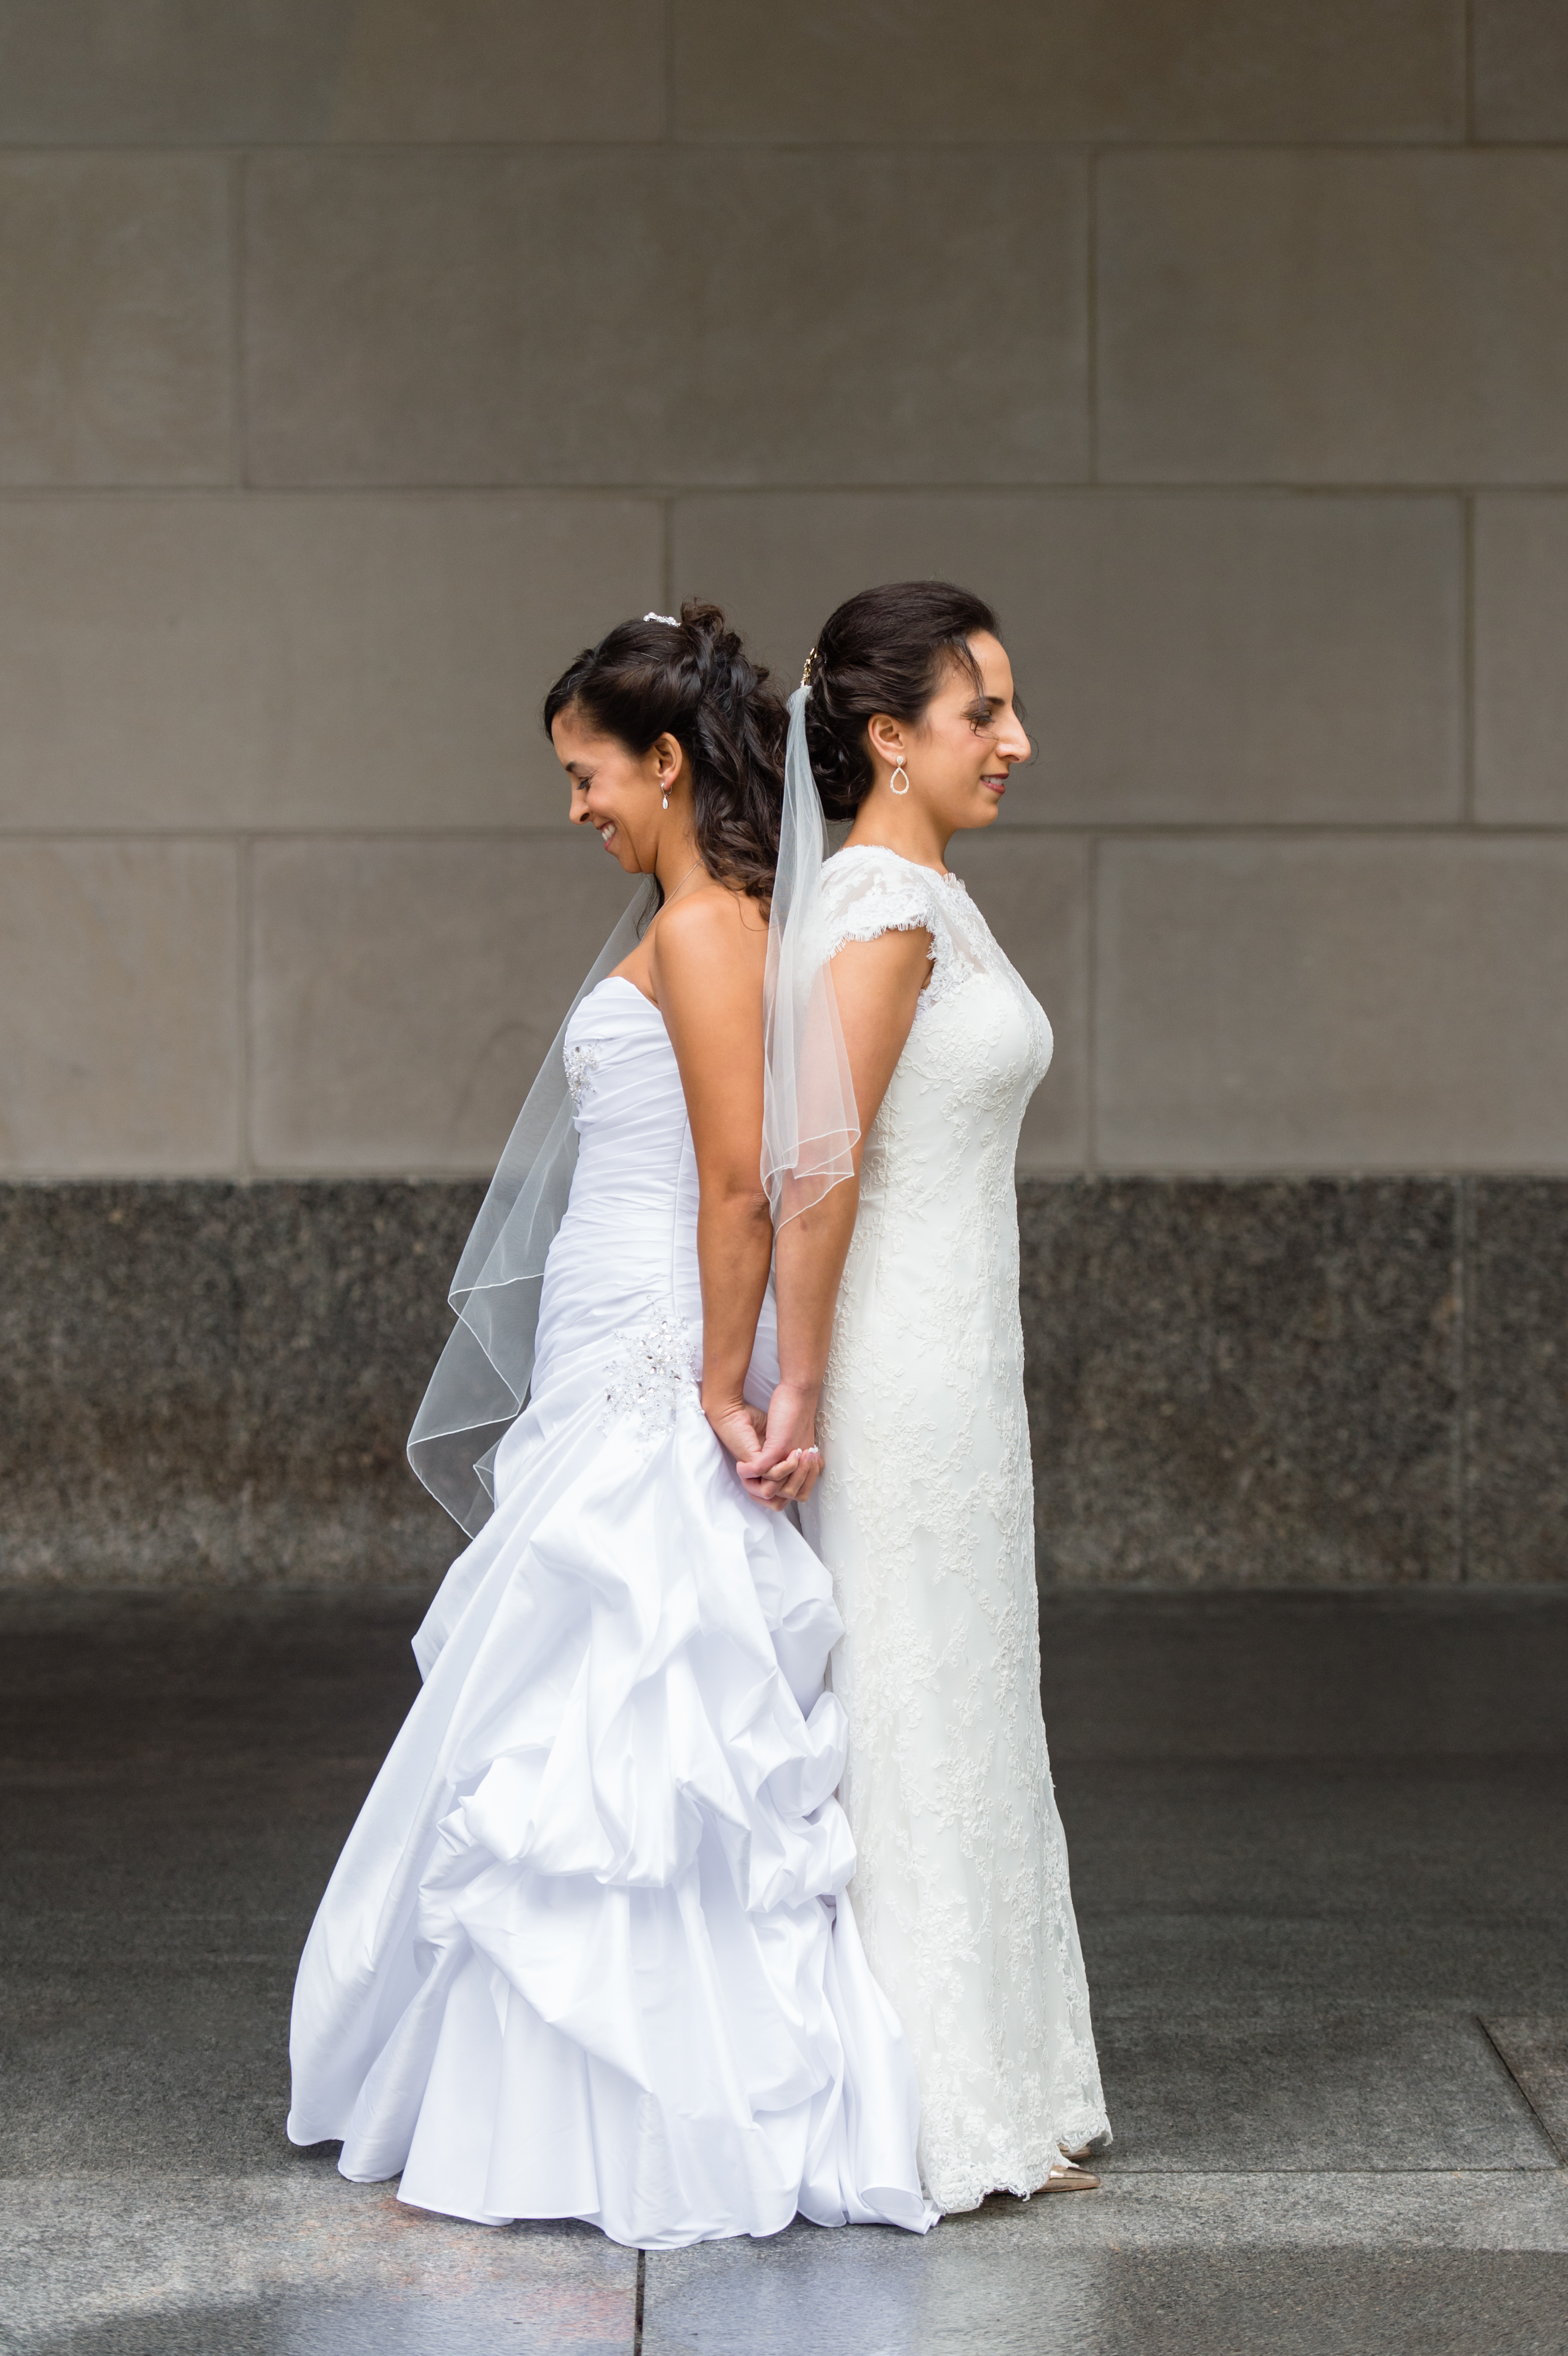 Elegant DC Wedding - Bellwether Events